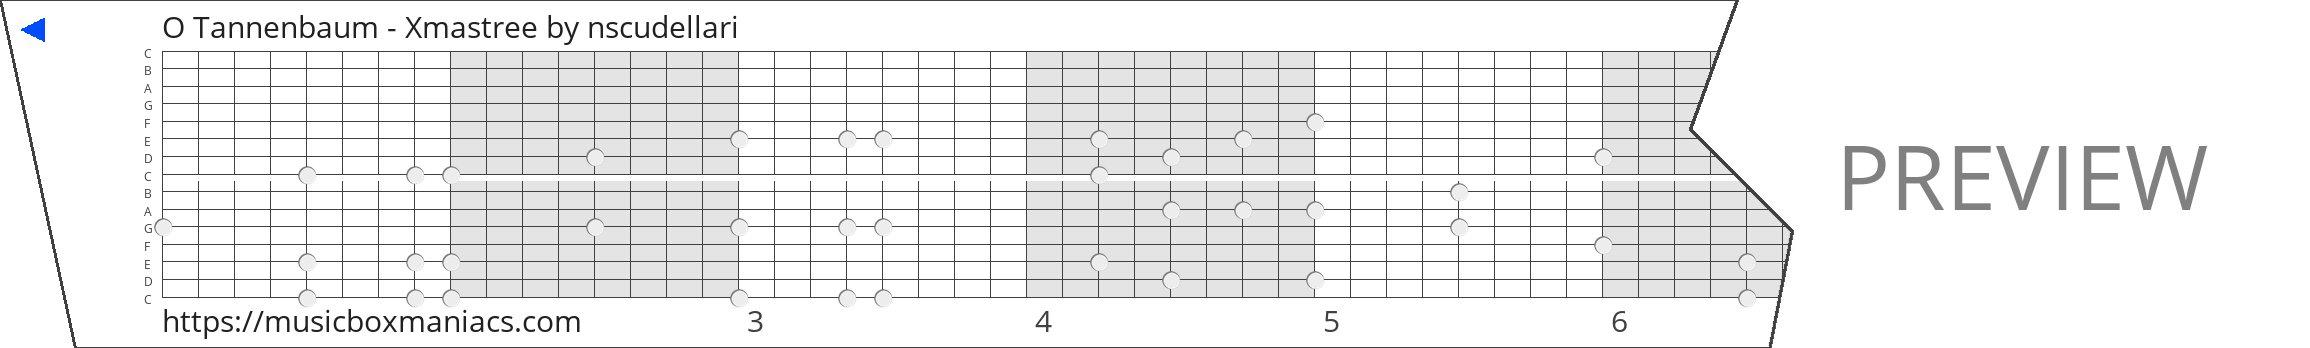 O Tannenbaum - Xmastree 15 note music box paper strip